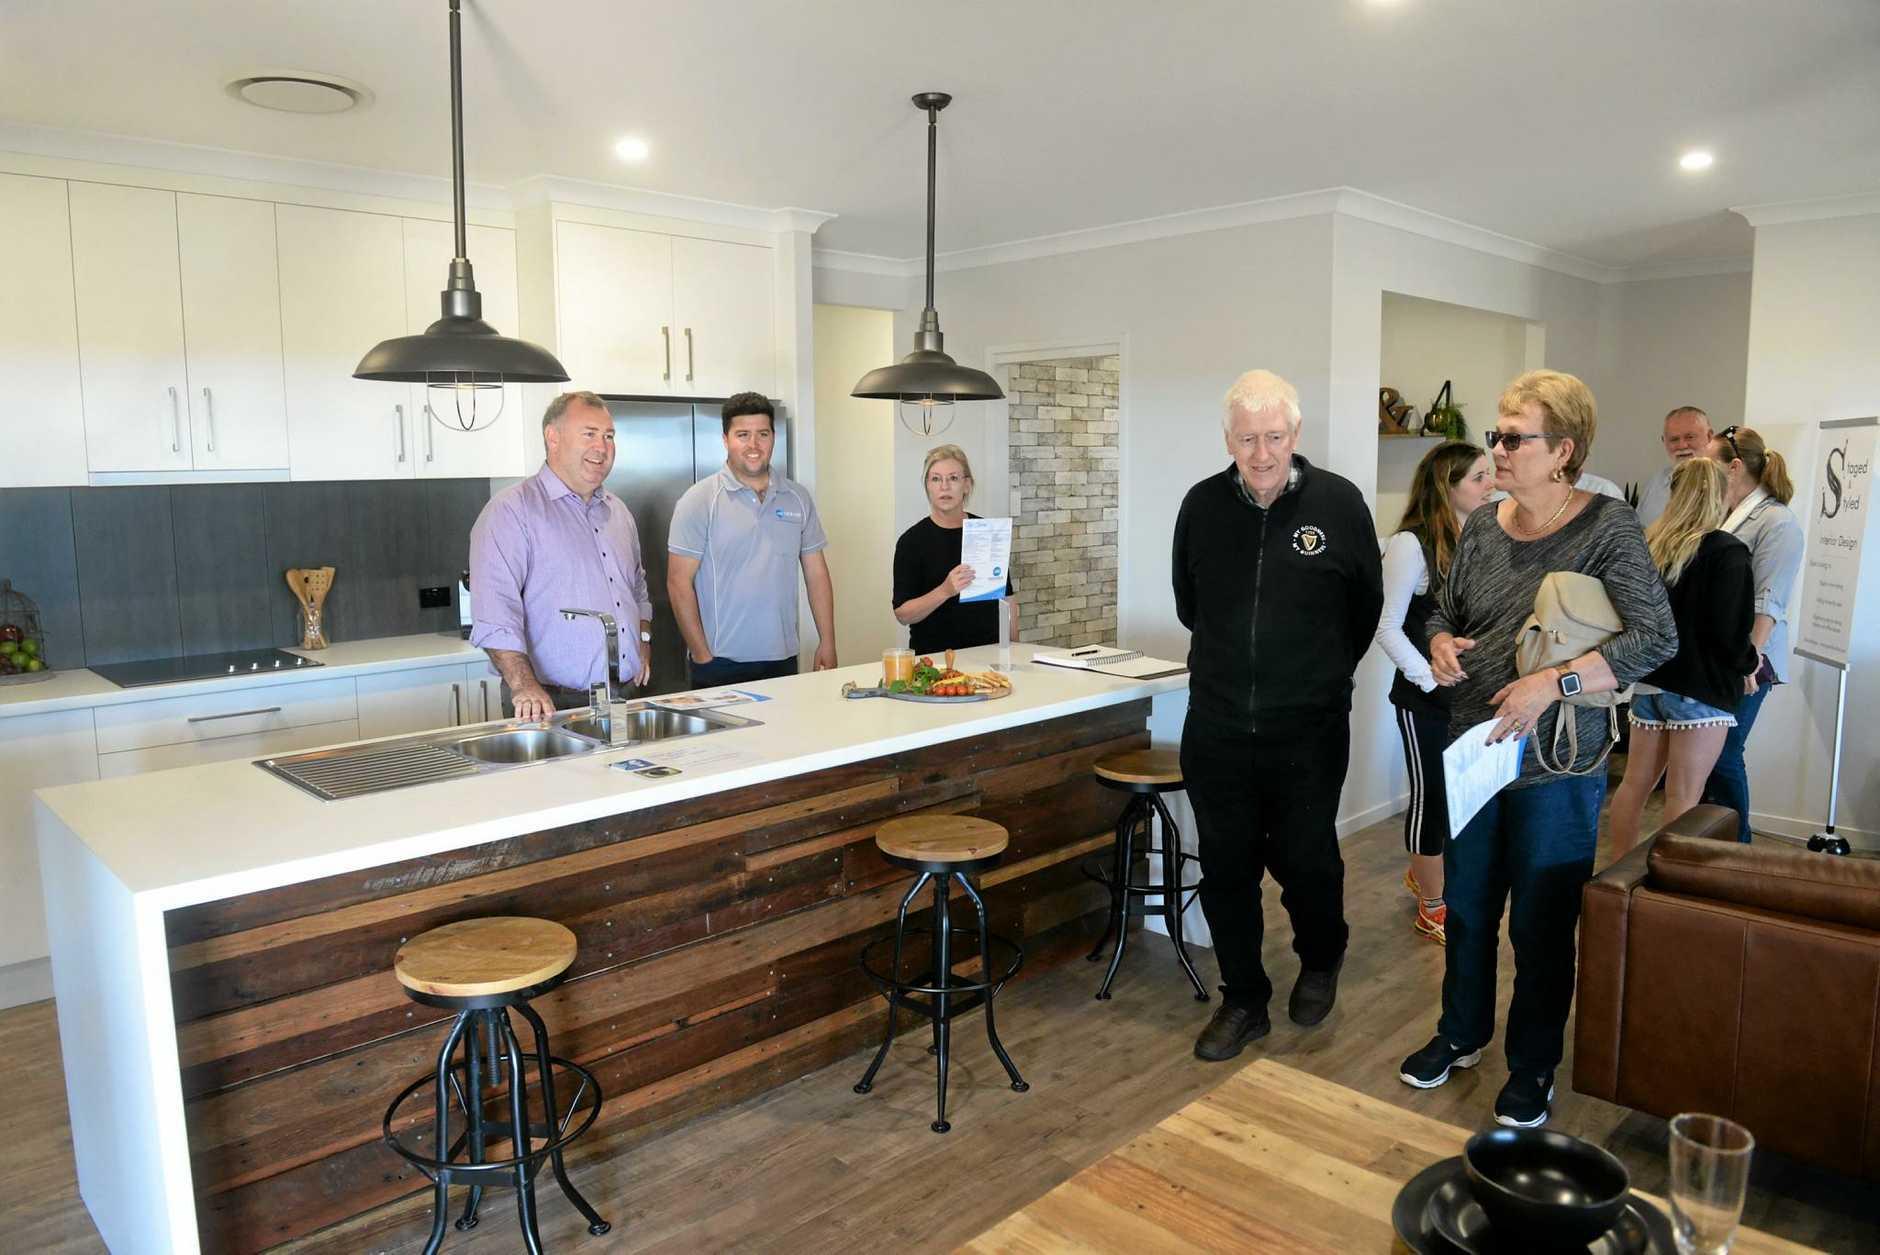 DISPLAY HOME: Jack Dempsey, Jesse Zielke, Leanne Donaldson and visitors at the JRZ display home in Belle Eden Estate.